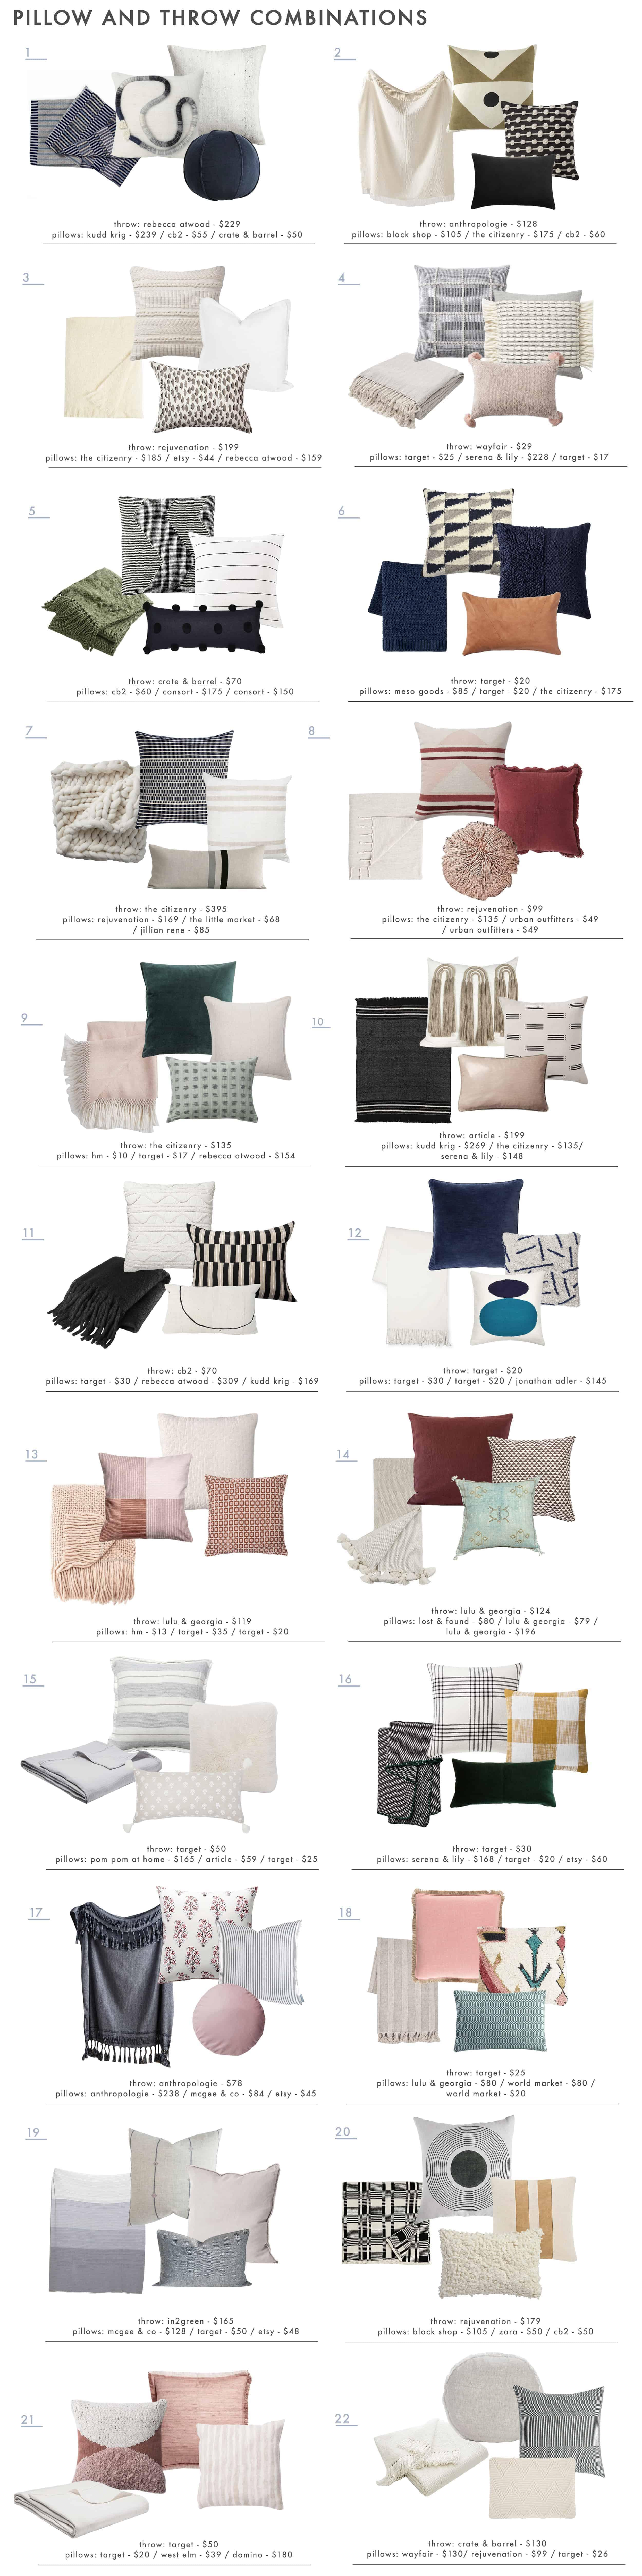 Emily Henderson Roundup Pillow Combos 2